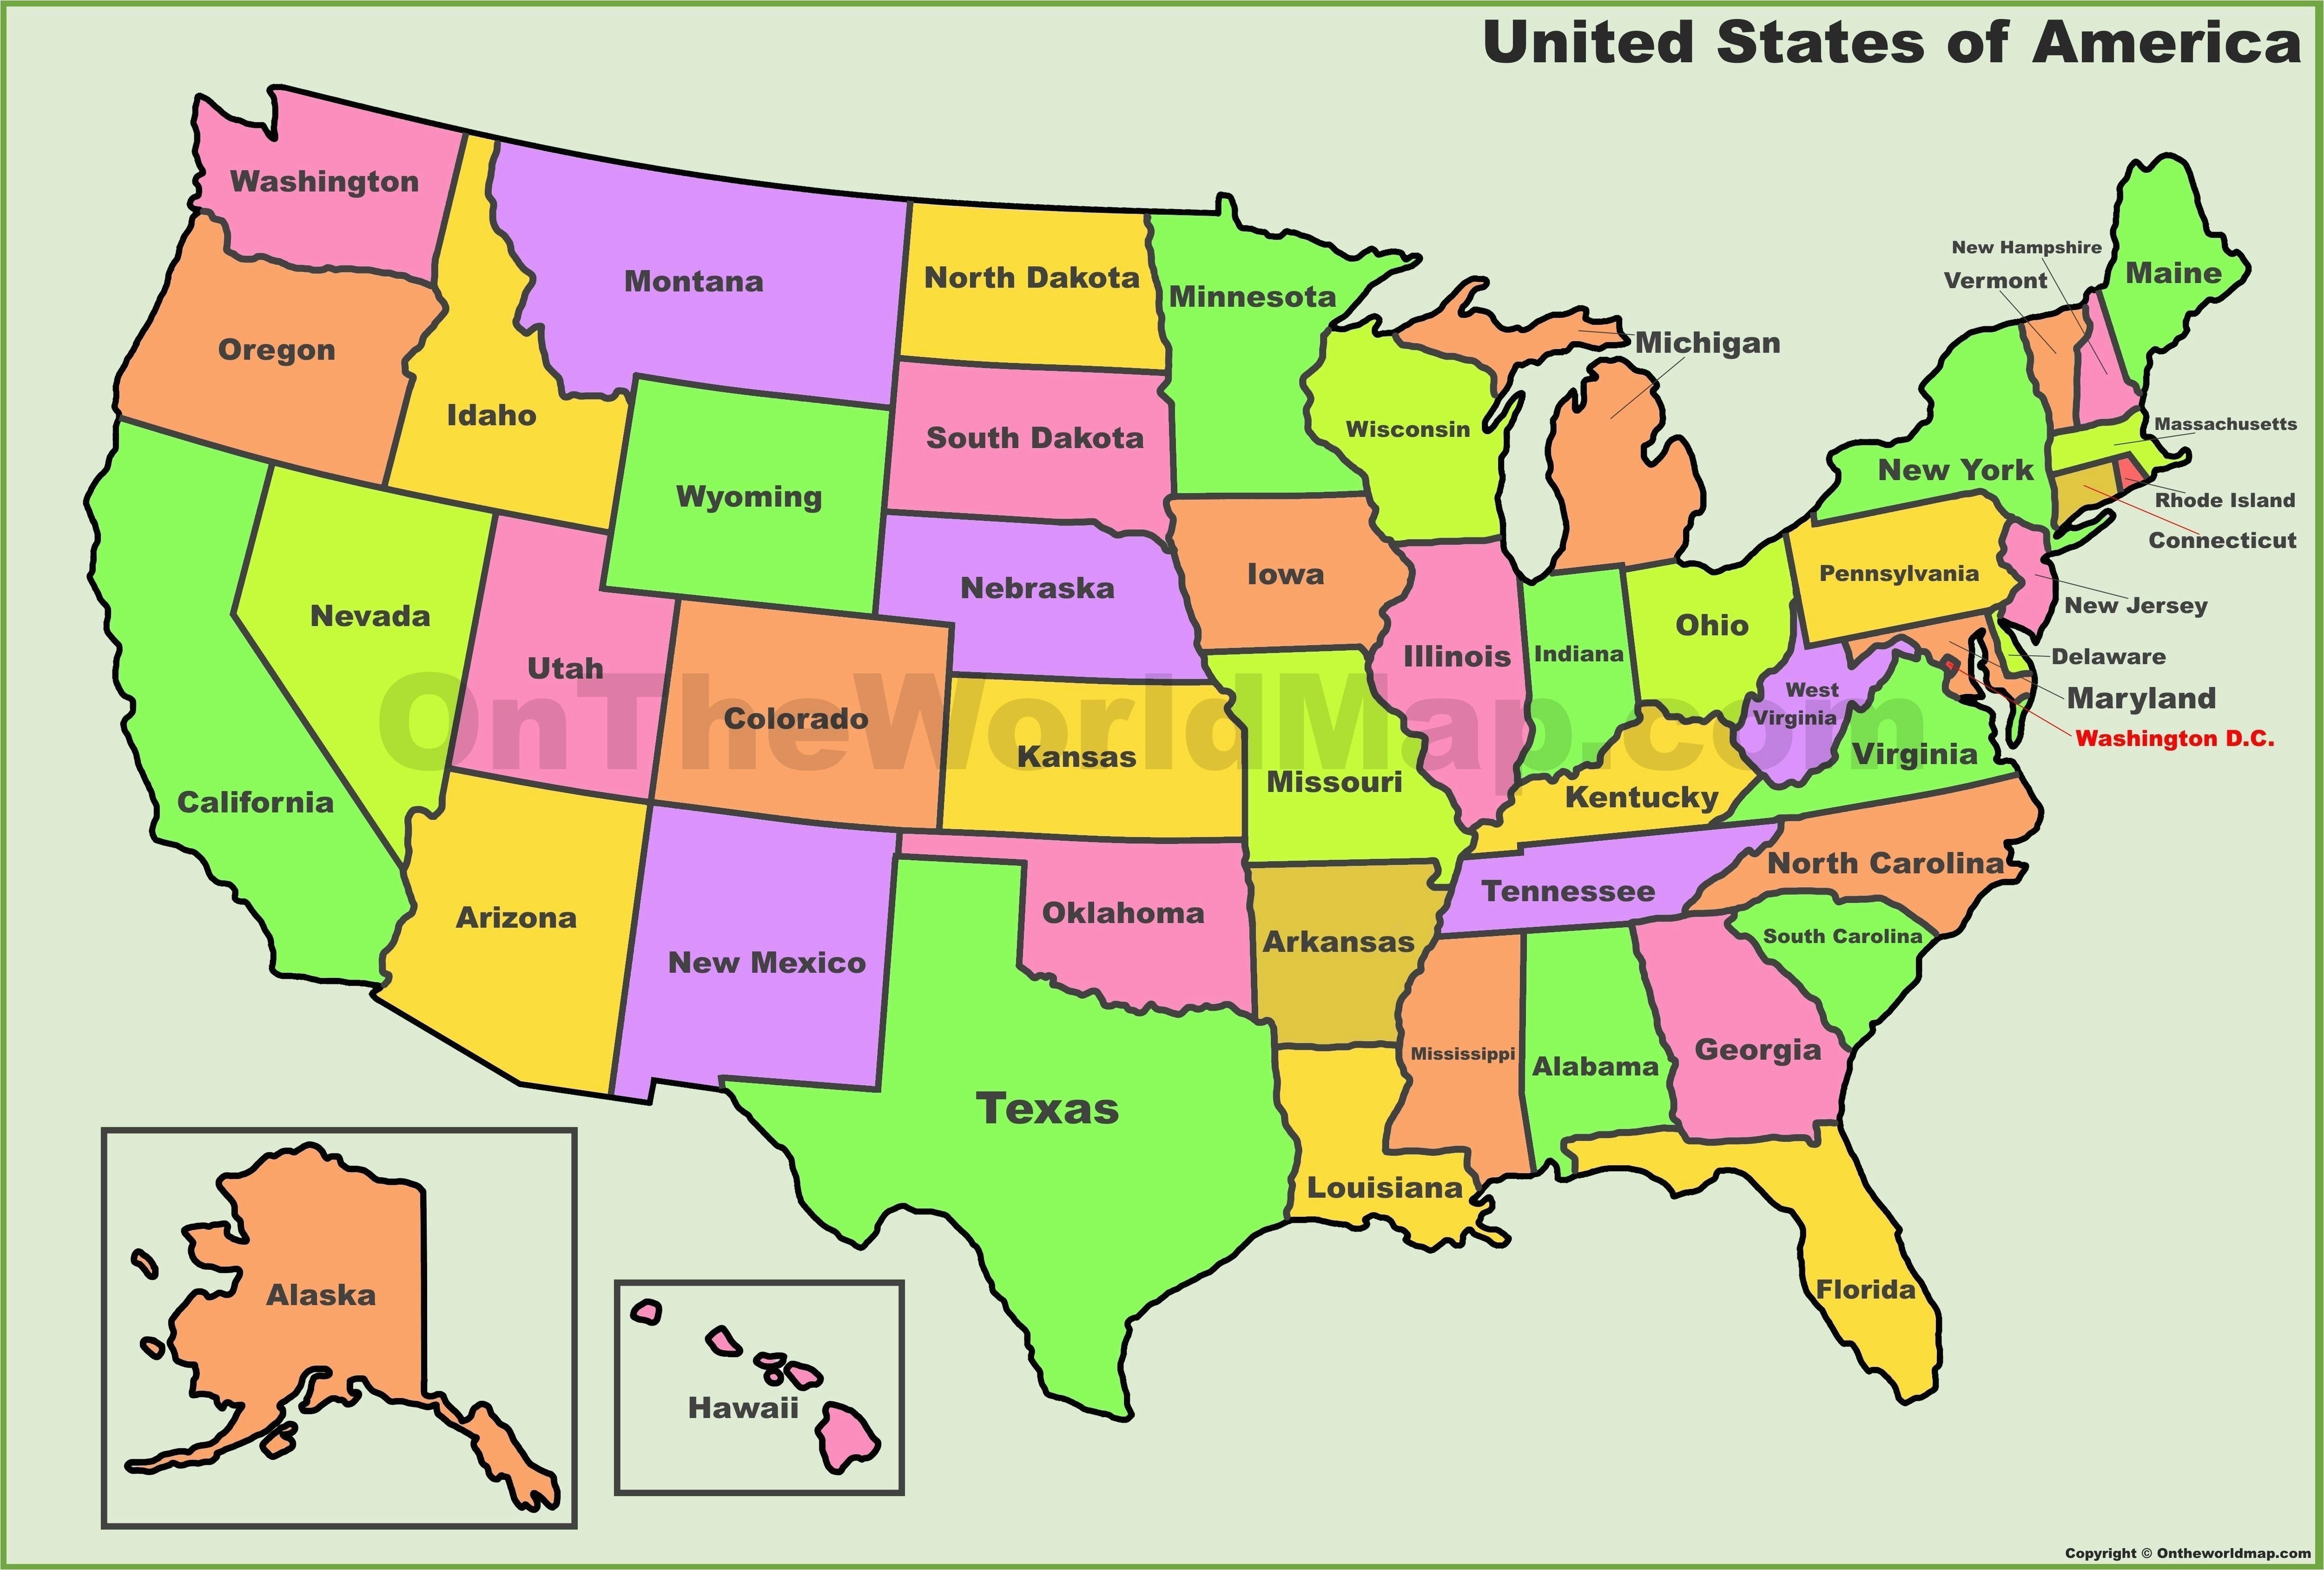 United States Map Florida.Florida Georgia Line Map United States Map State Borders Fresh